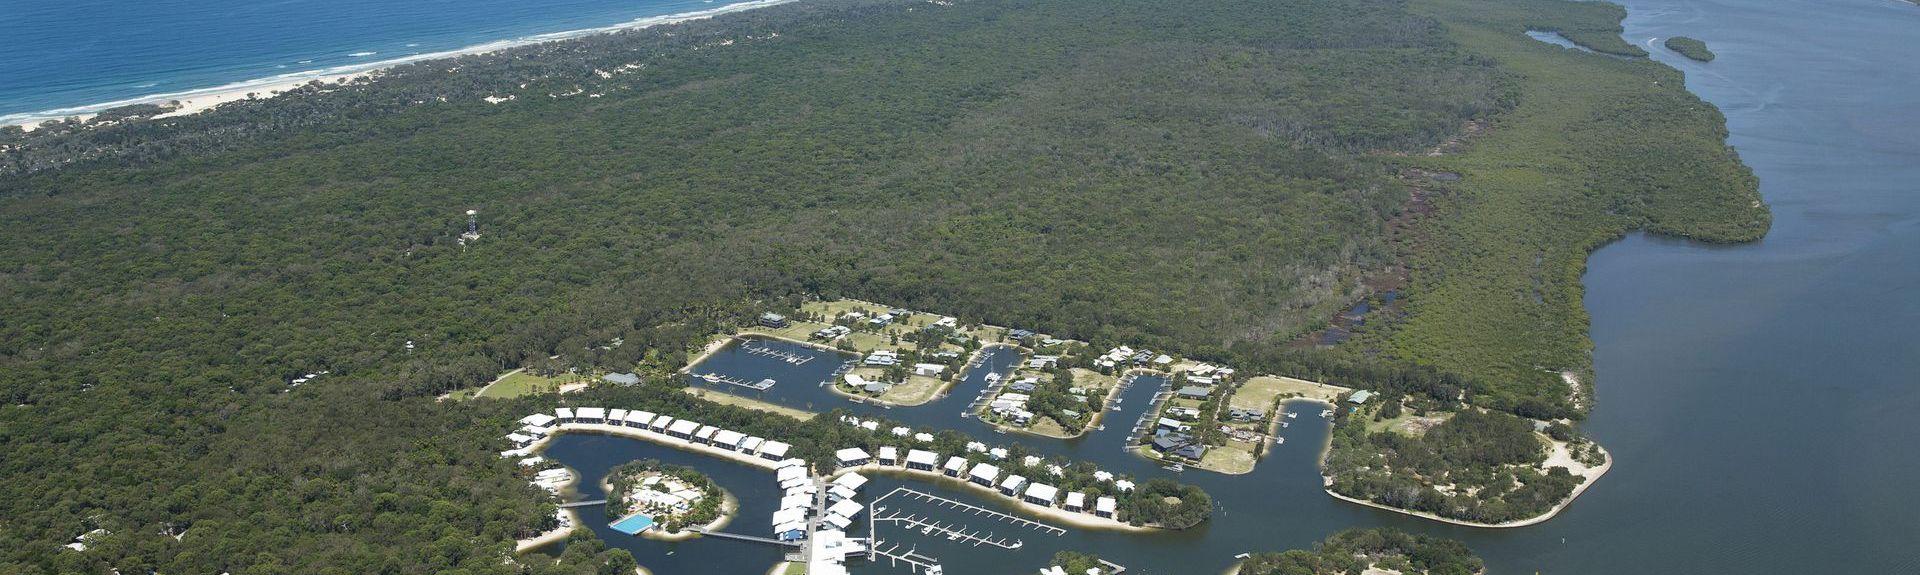 Russell Island QLD, Australia